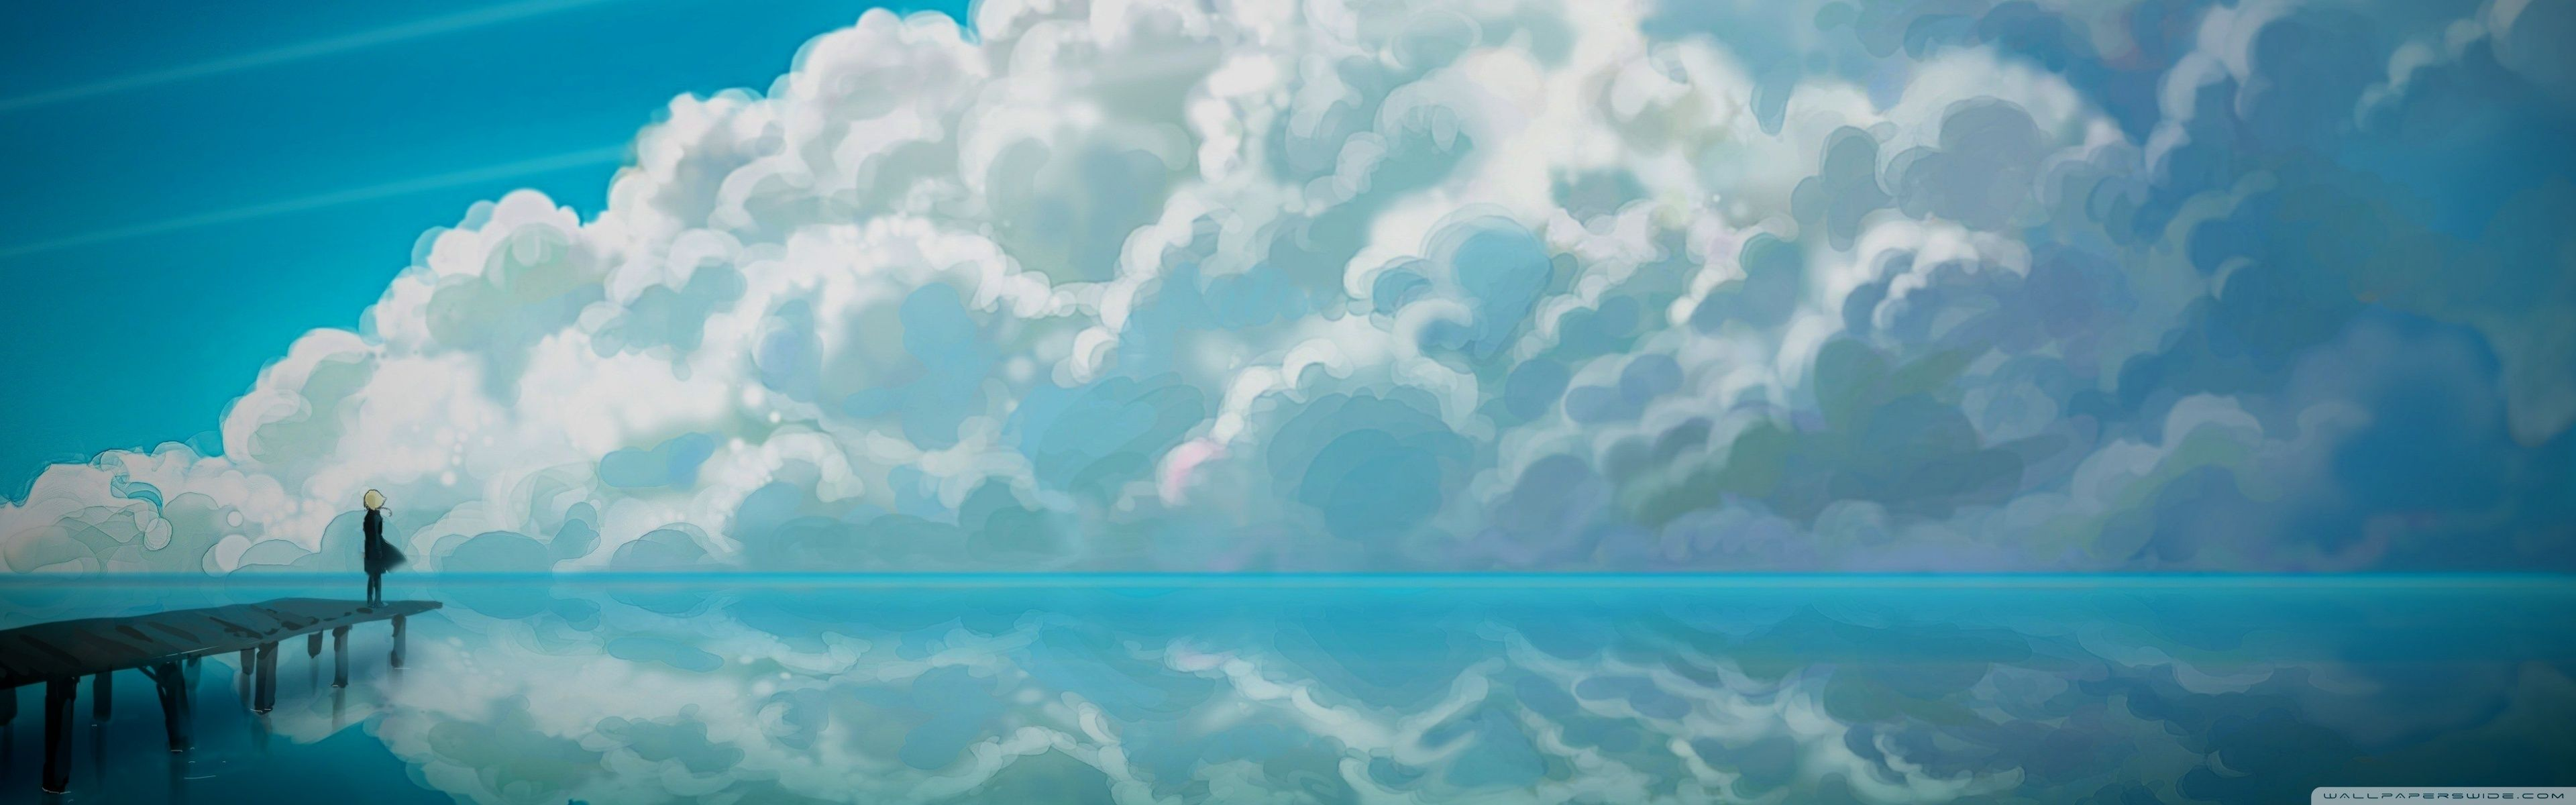 23 Dual Monitor Wallpaper 1440p Anime Baka Wallpaper